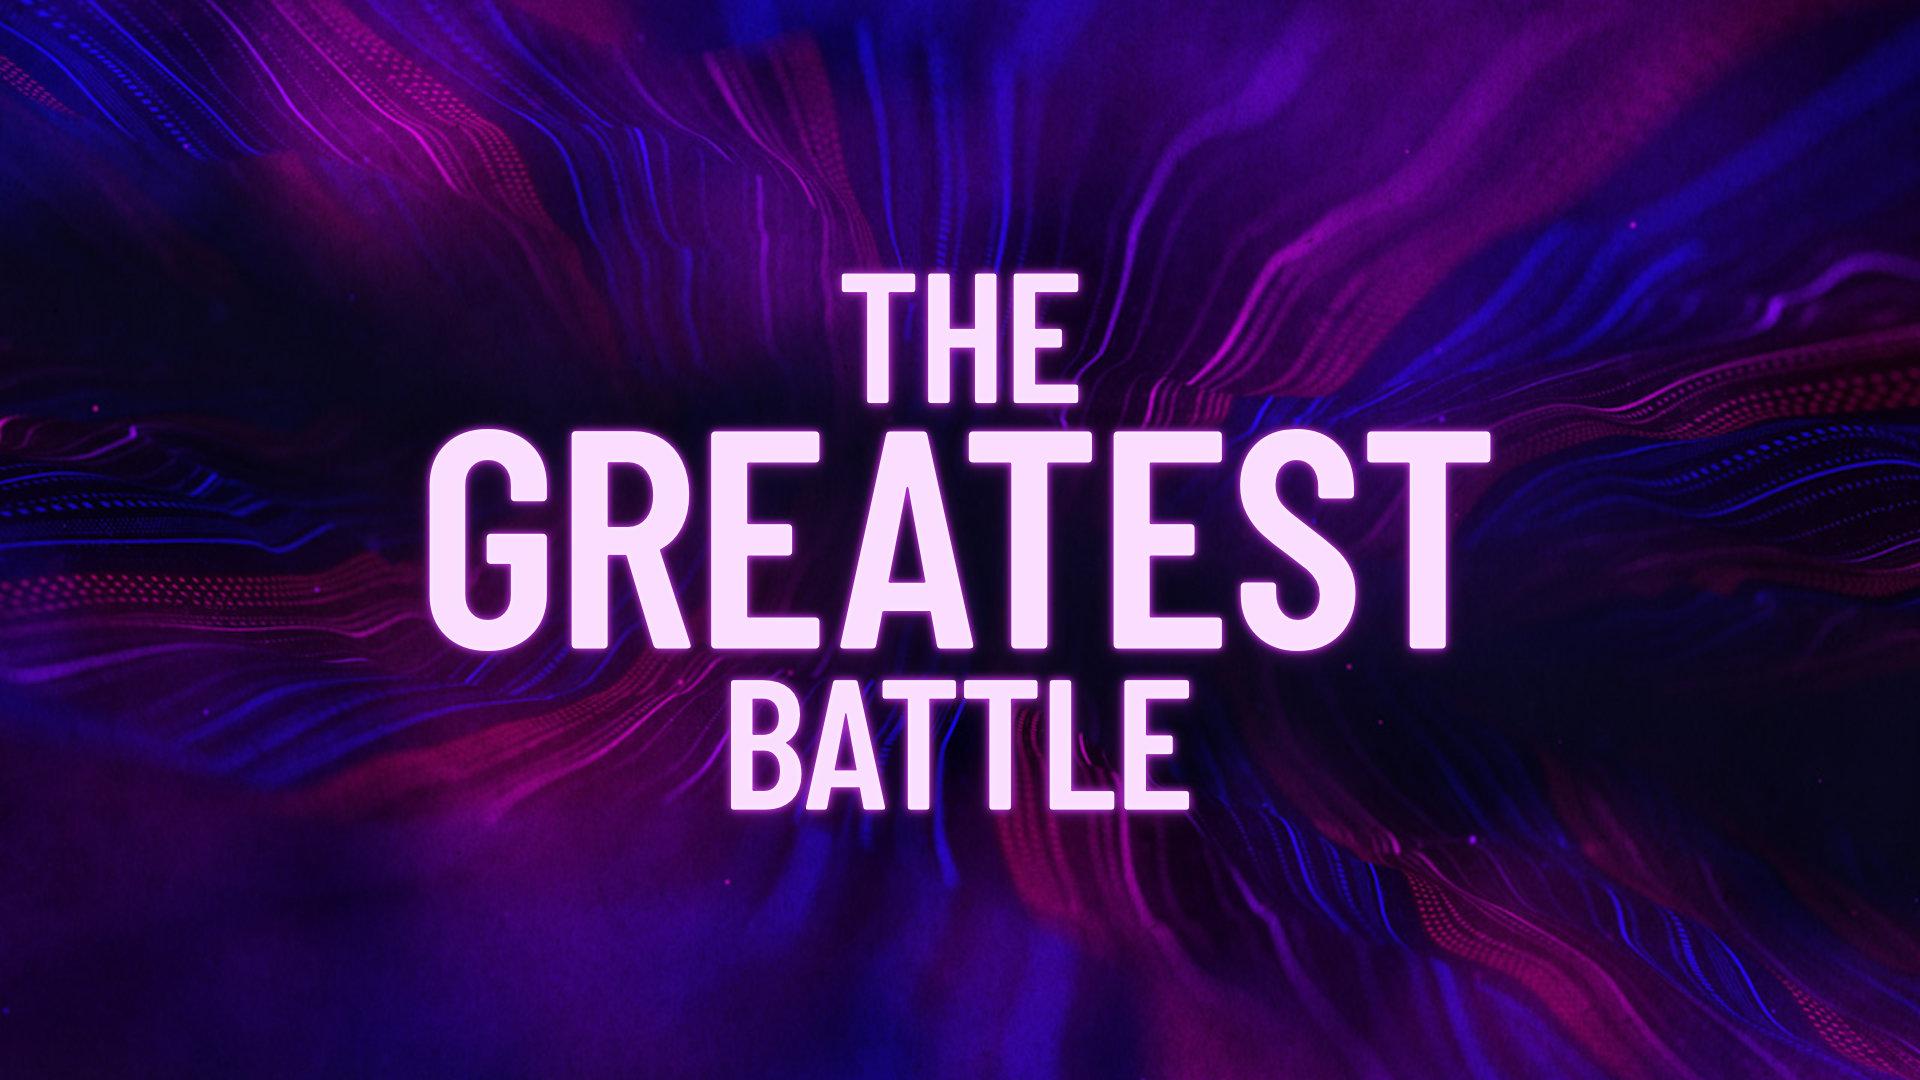 2019-04-21 The Greatest Battle.jpg